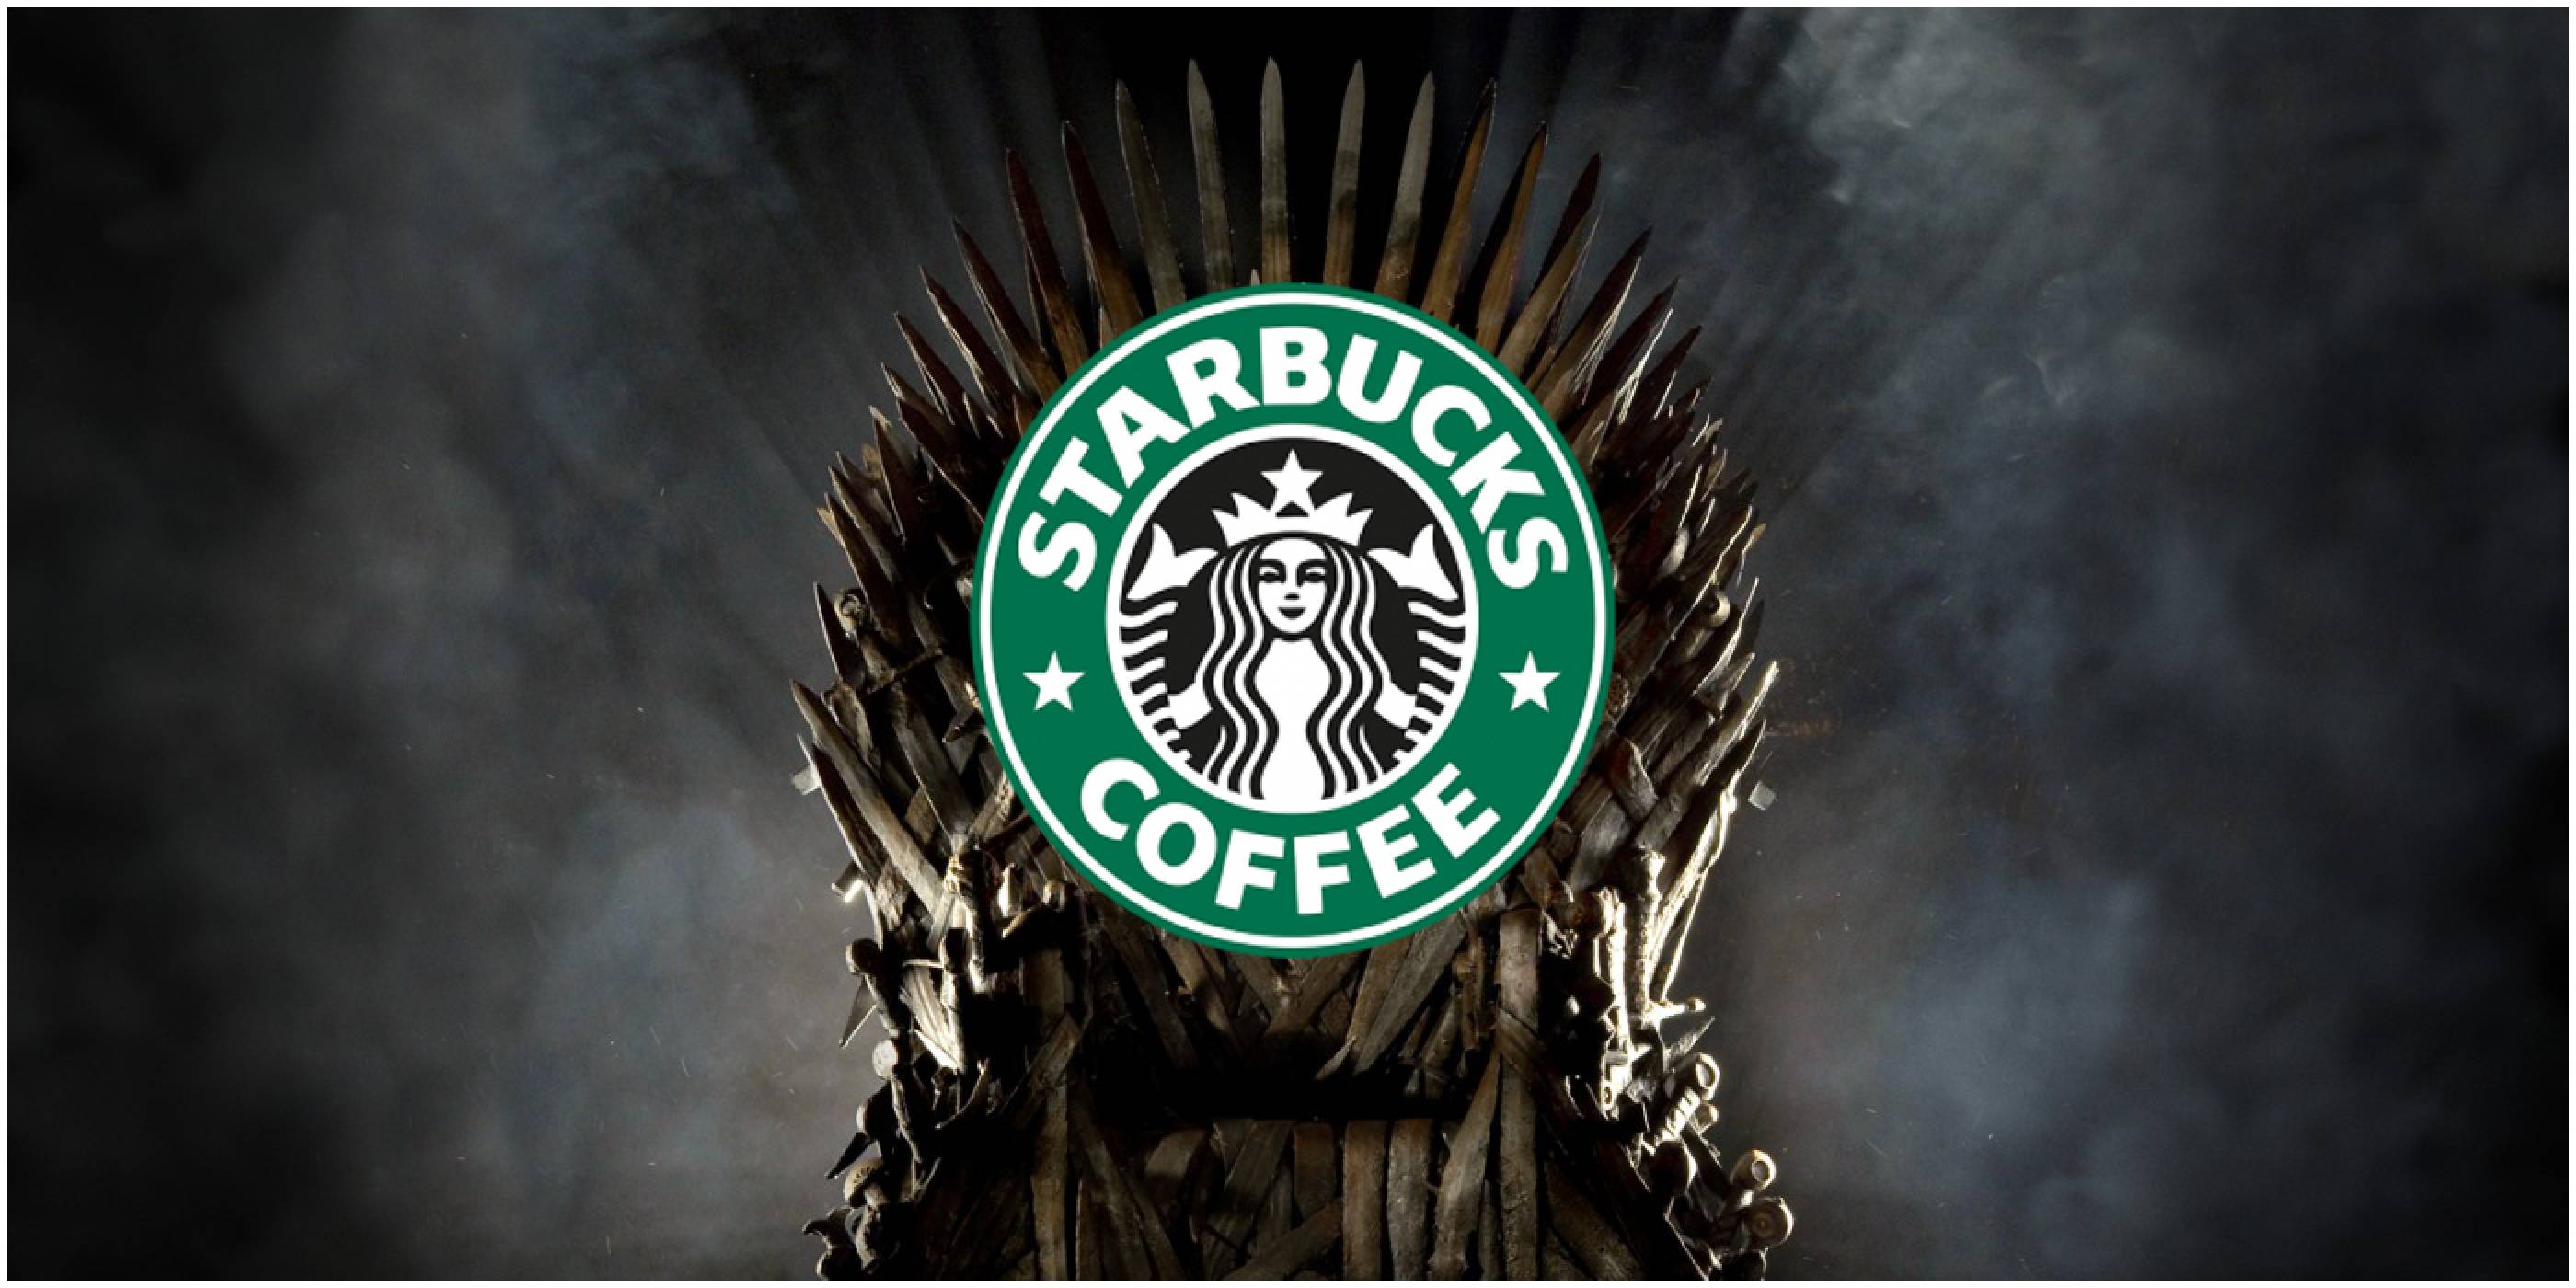 Starbucks в Game of Thrones? WTF?